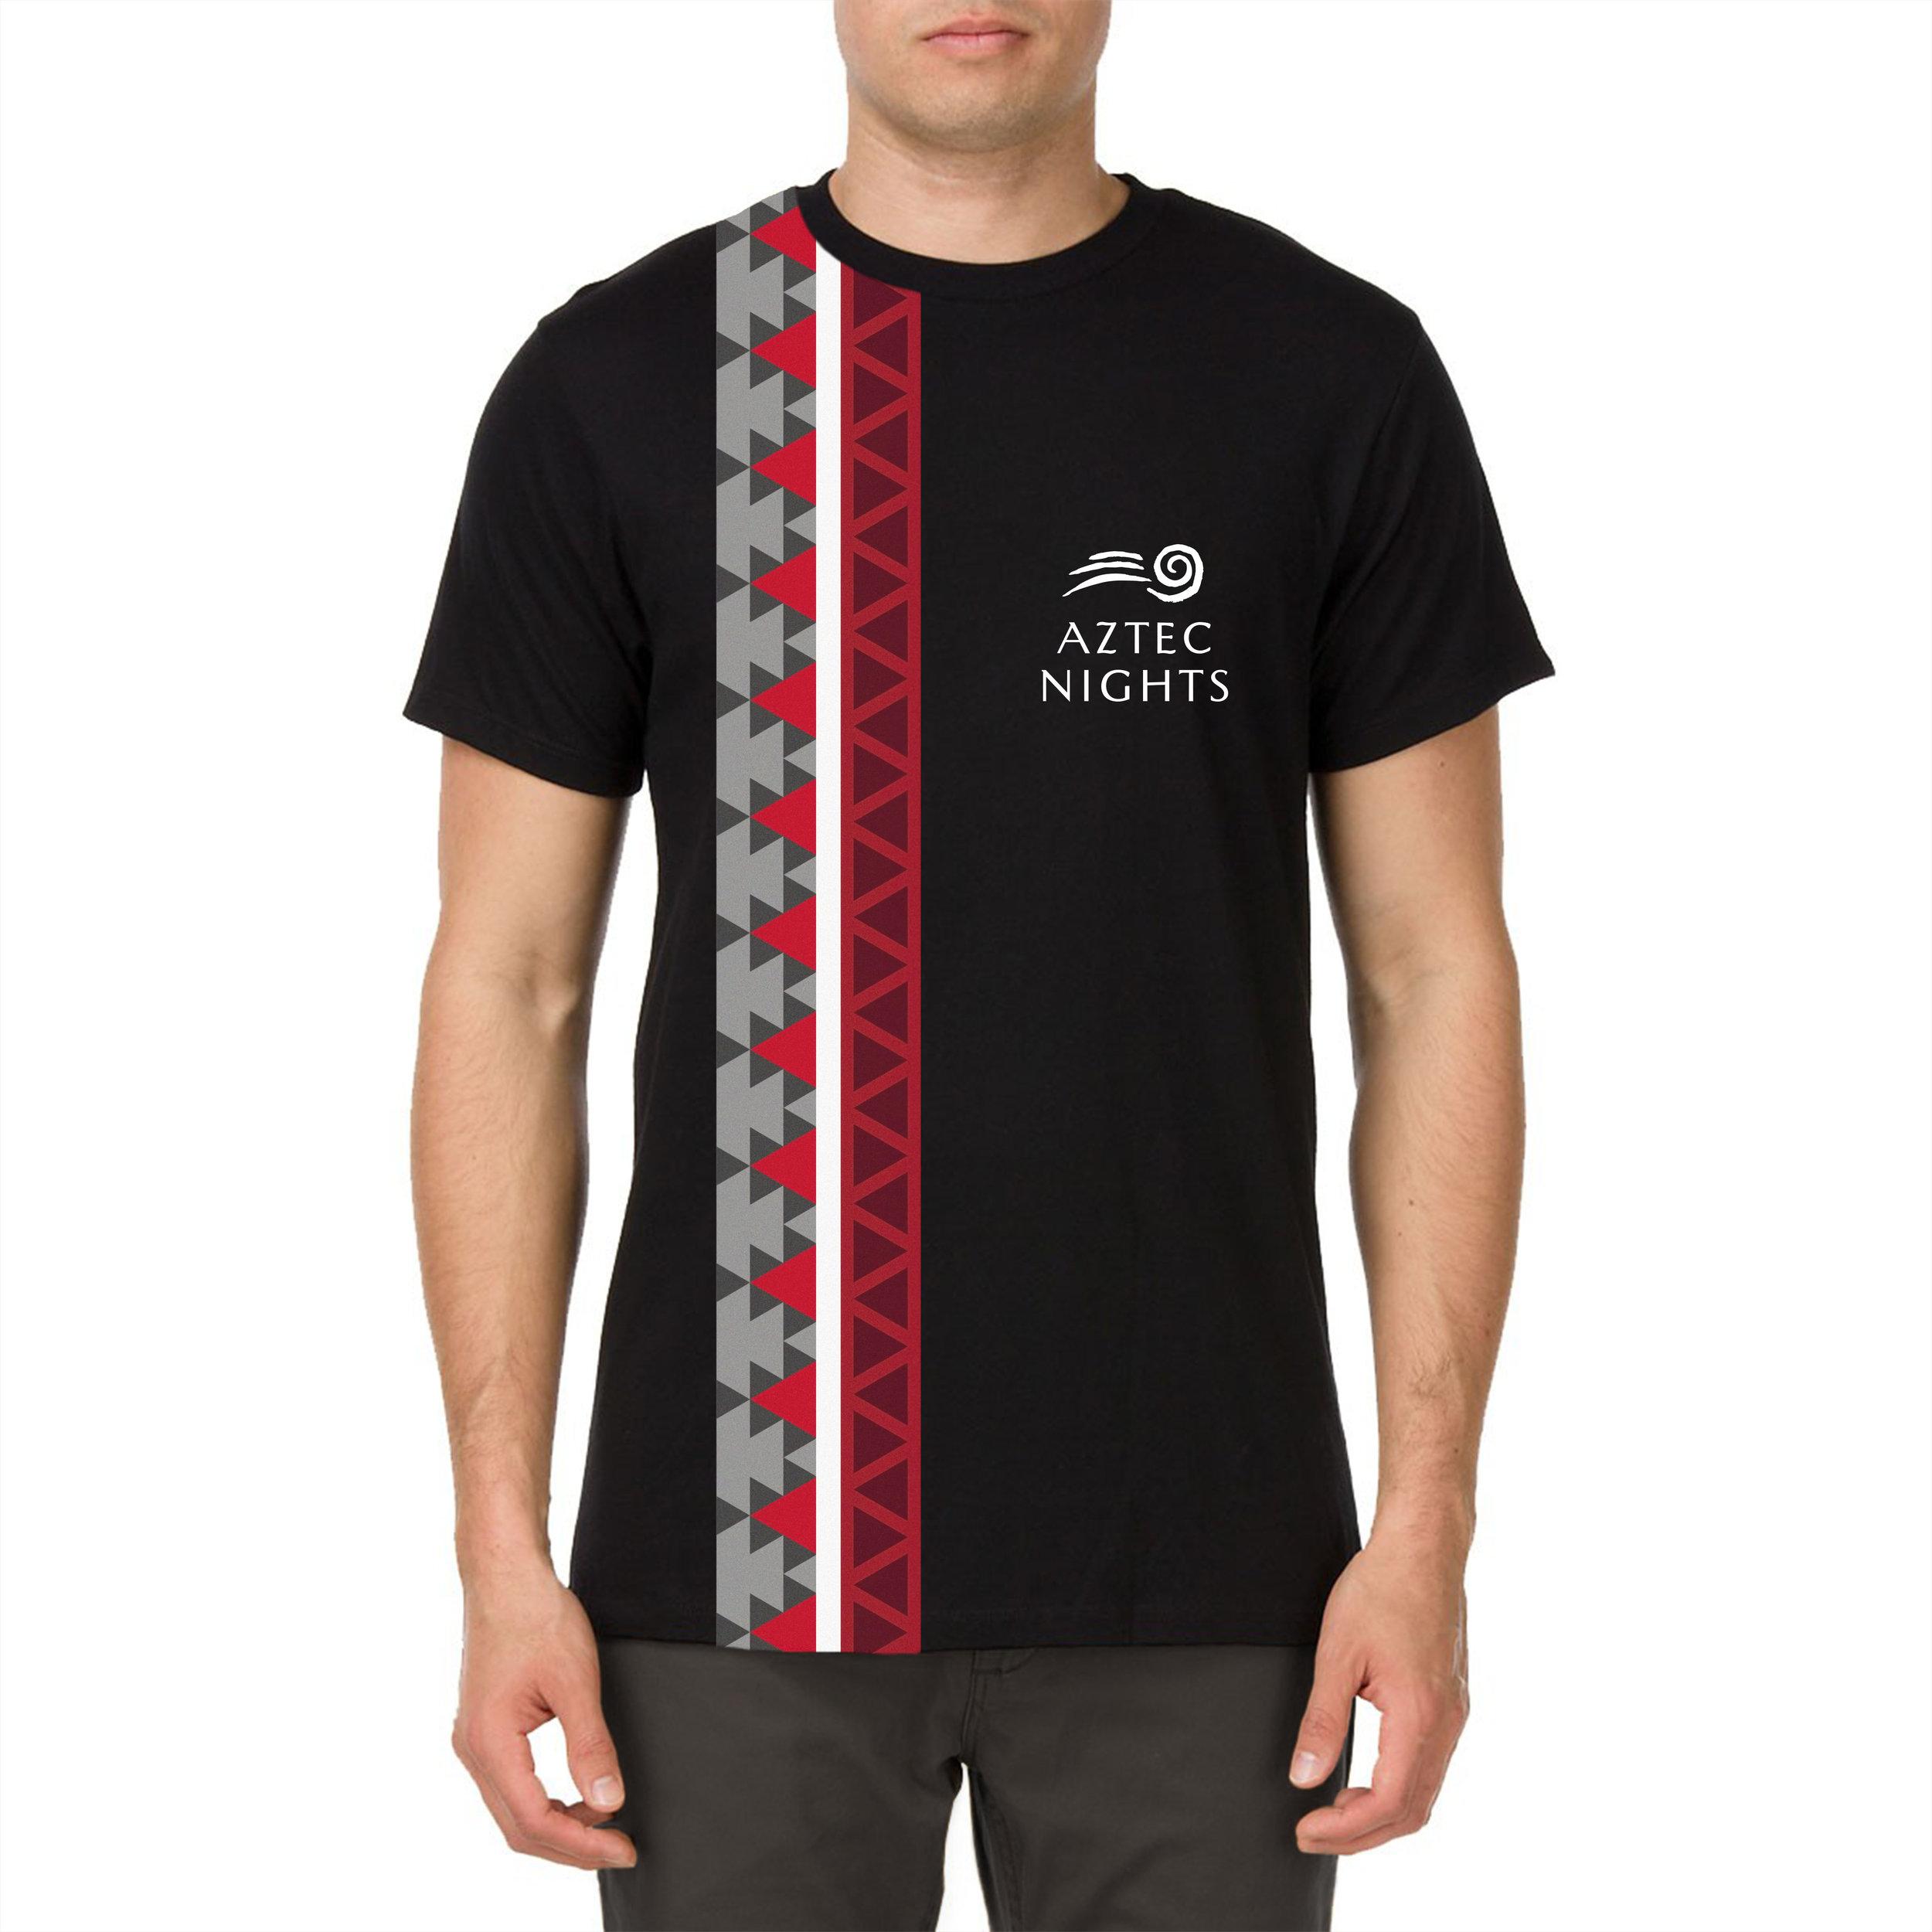 Aztec Nights Template 1 T-shirt design